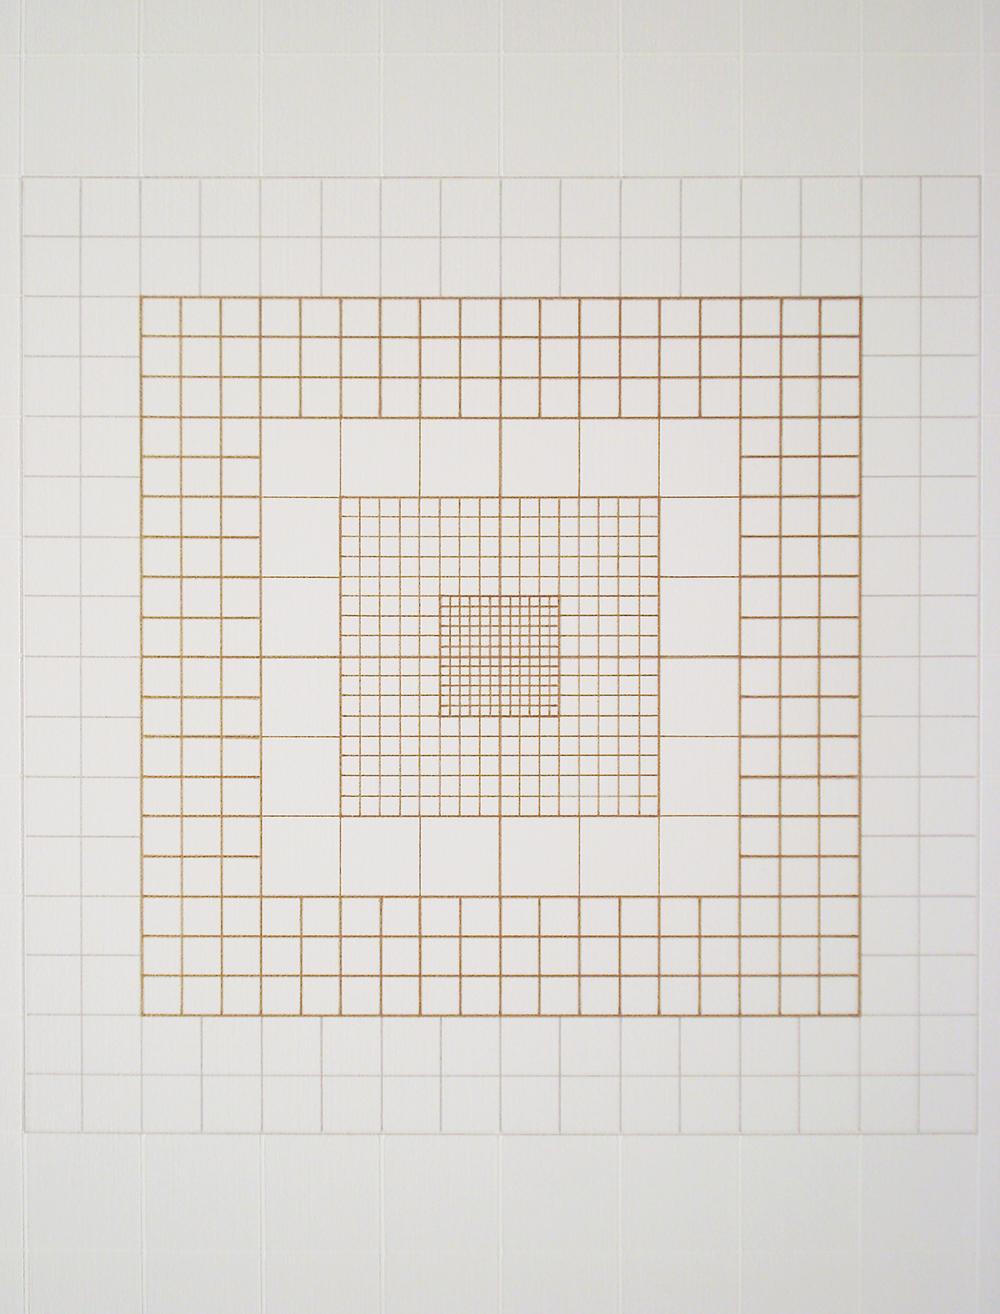 Yantra-origo-metrum [20180512]_2018_acrylic-on-canvas_29 1-2x29 1-2in.[75x75cm]-2_kB.jpg